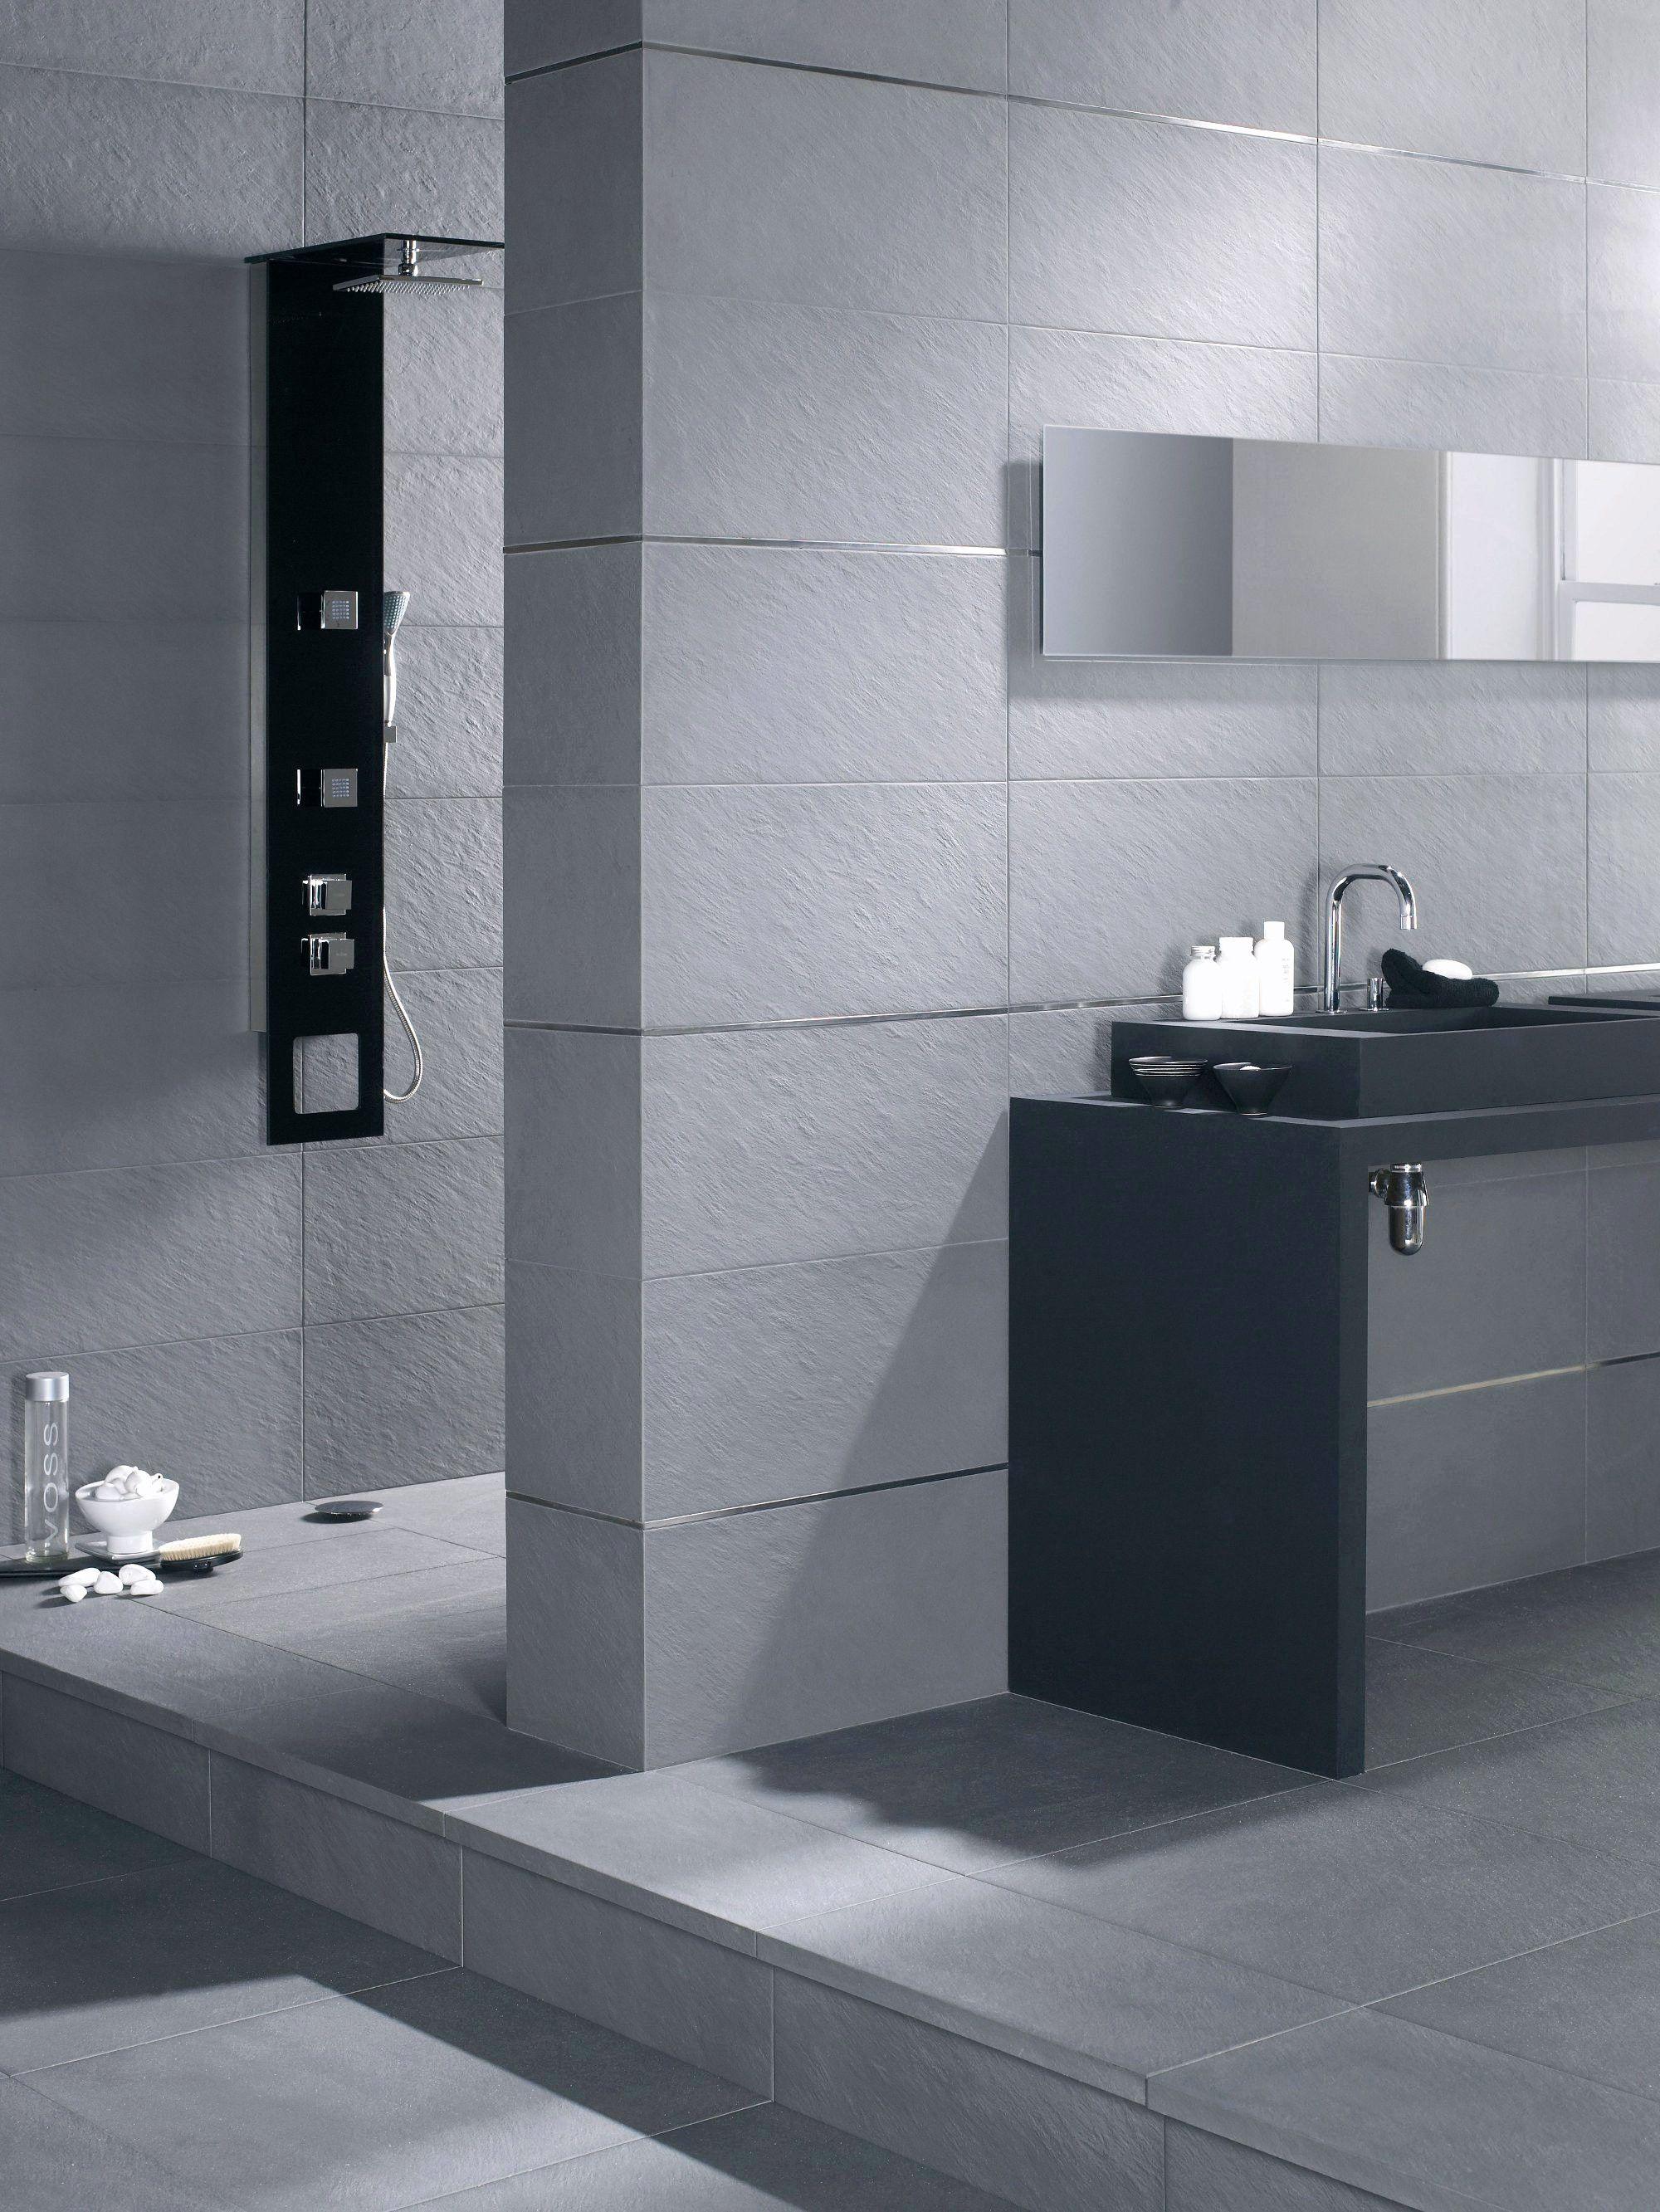 Badezimmer Fliesen Mosaik Badezimmer Fliesen Badezimmer Badezimmer Quadratisch